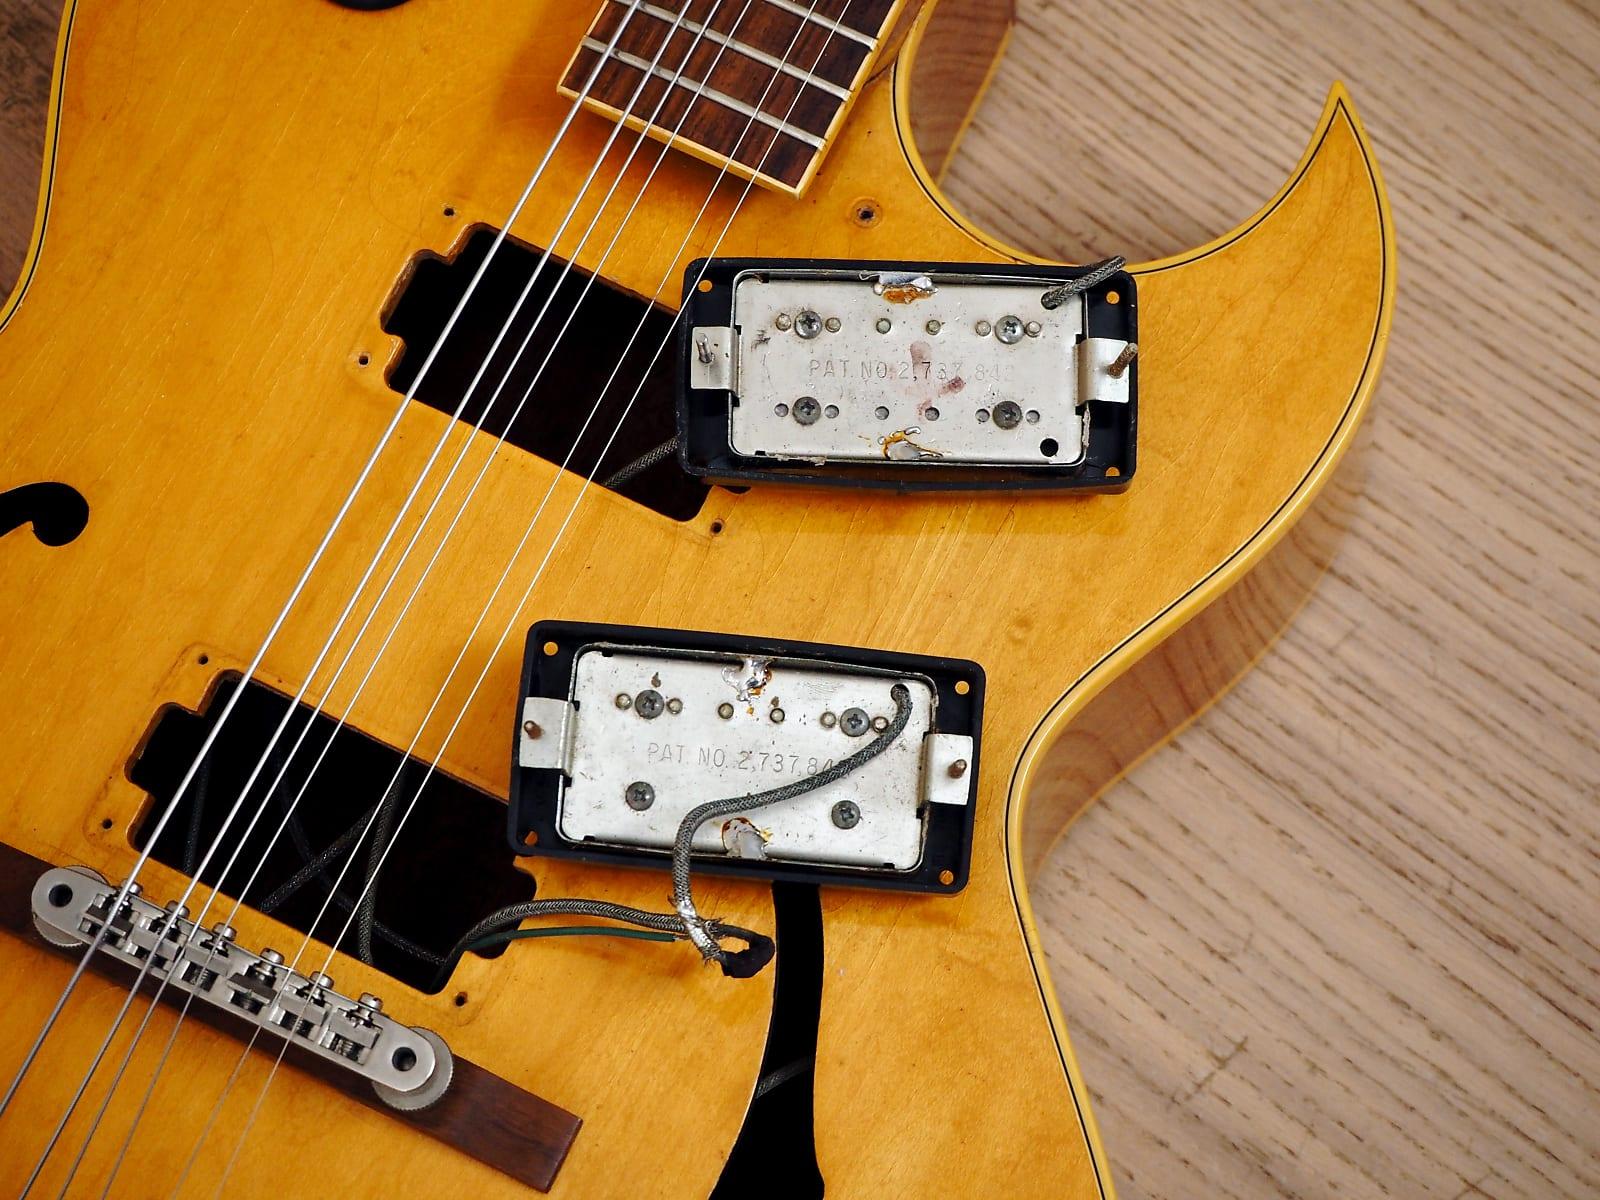 Gibson ES-175D from 1990 and its peculiarities-hu4v7qiuv5xvs8ecdv9c-jpg